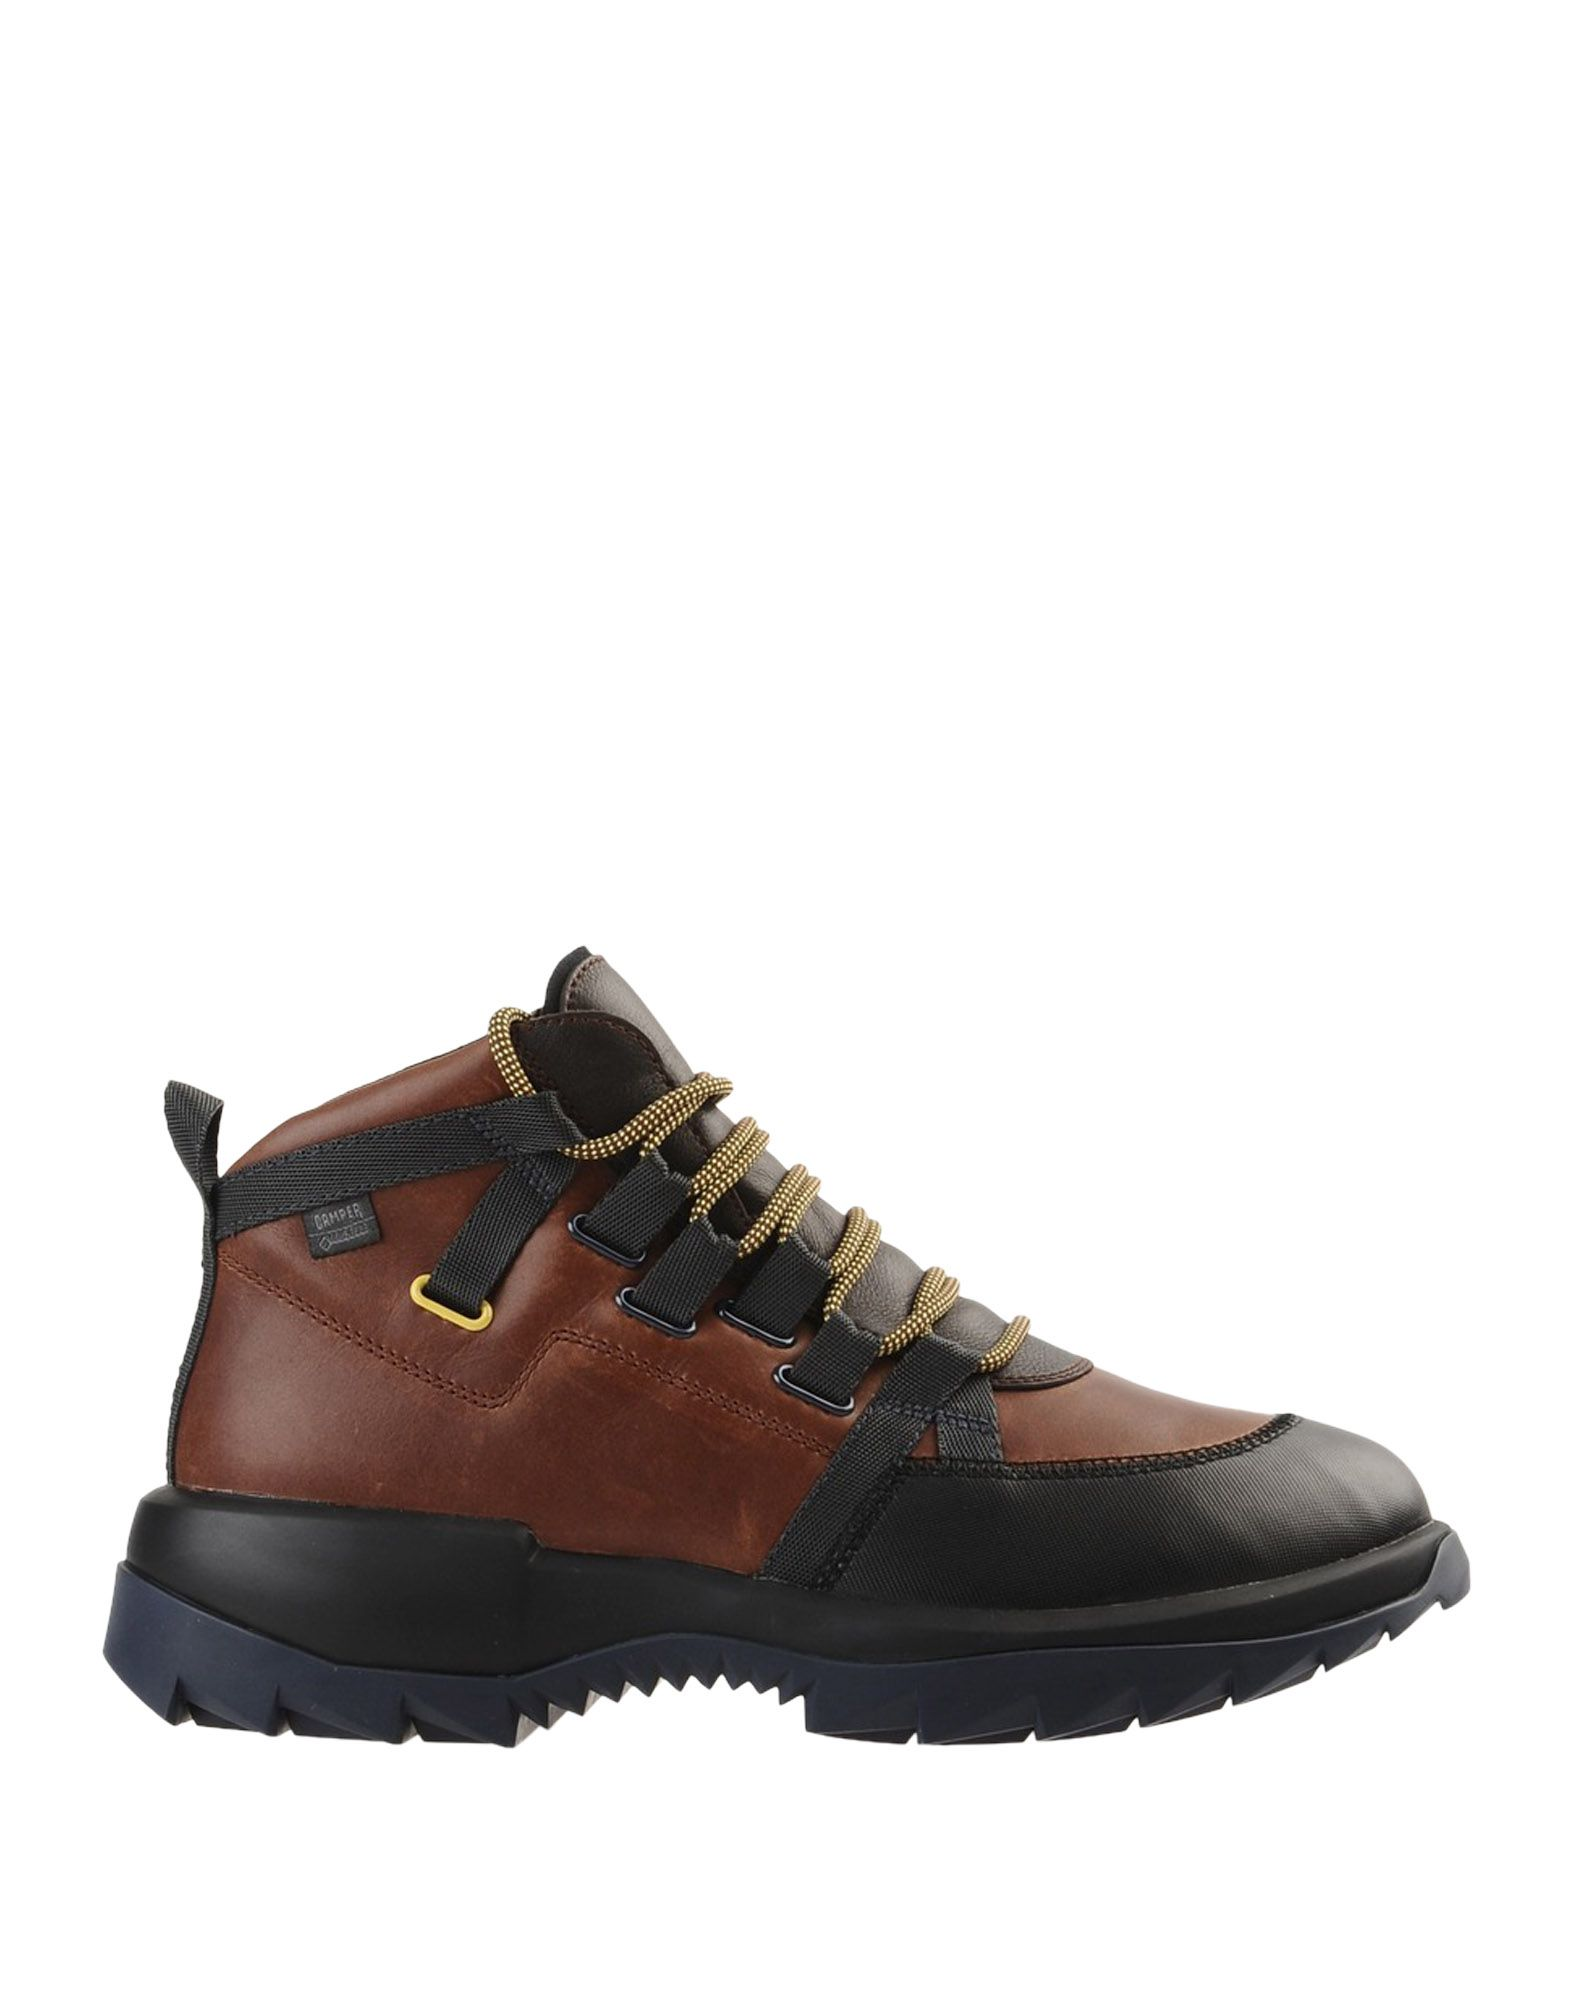 Camper Sneakers Sneakers - Men Camper Sneakers Camper online on  United Kingdom - 11567293RH 666d66